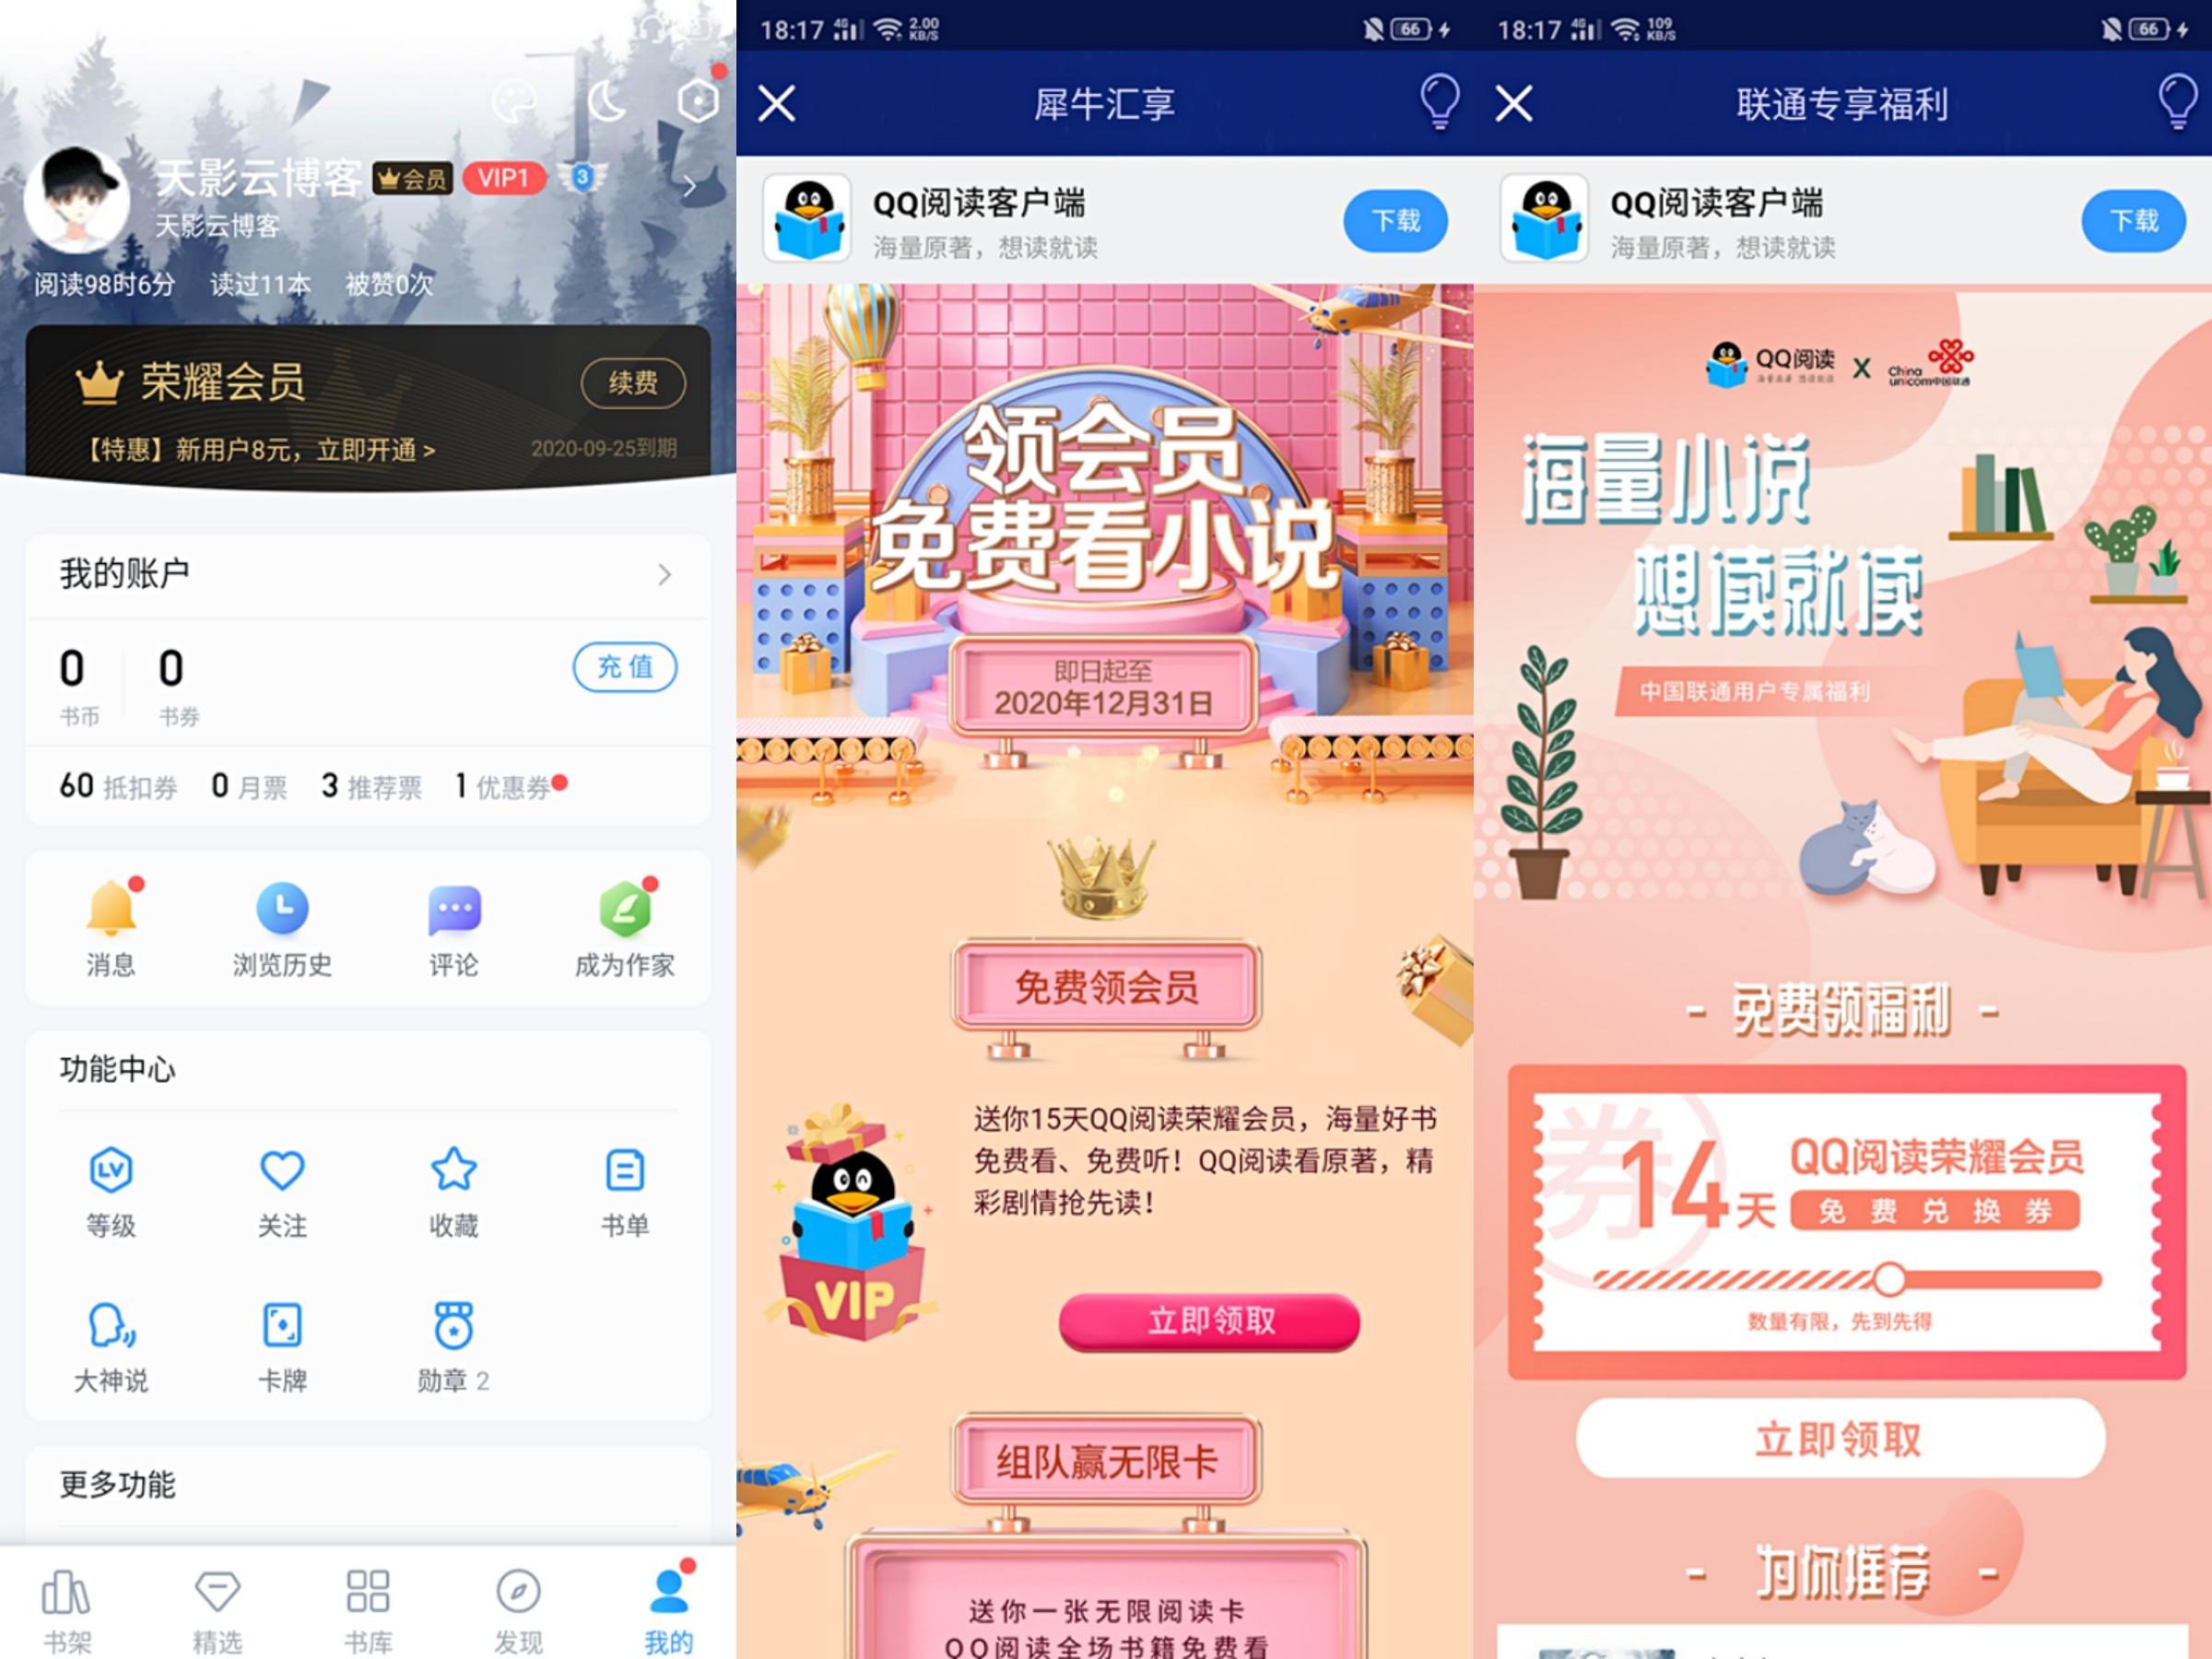 QQ阅读免费领29天图书会员